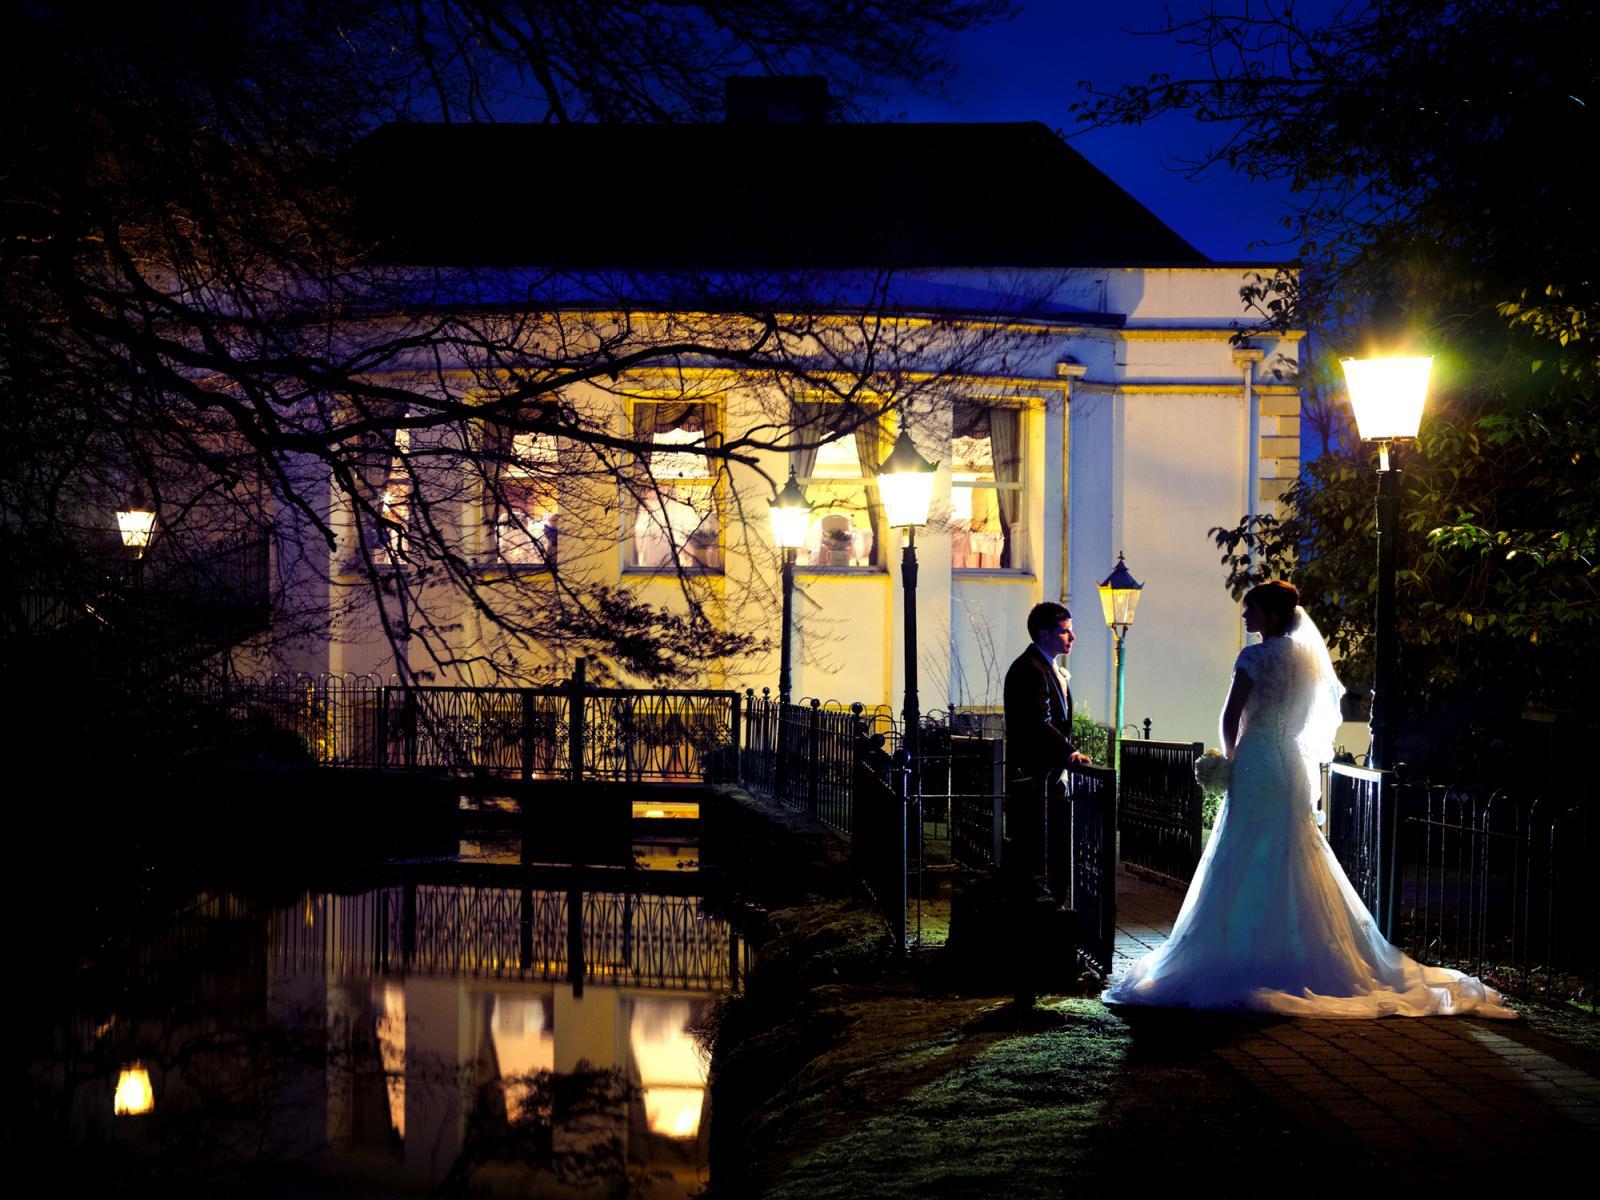 Wedding Venue - FLMNGJ 0419 8x6 email.jpg